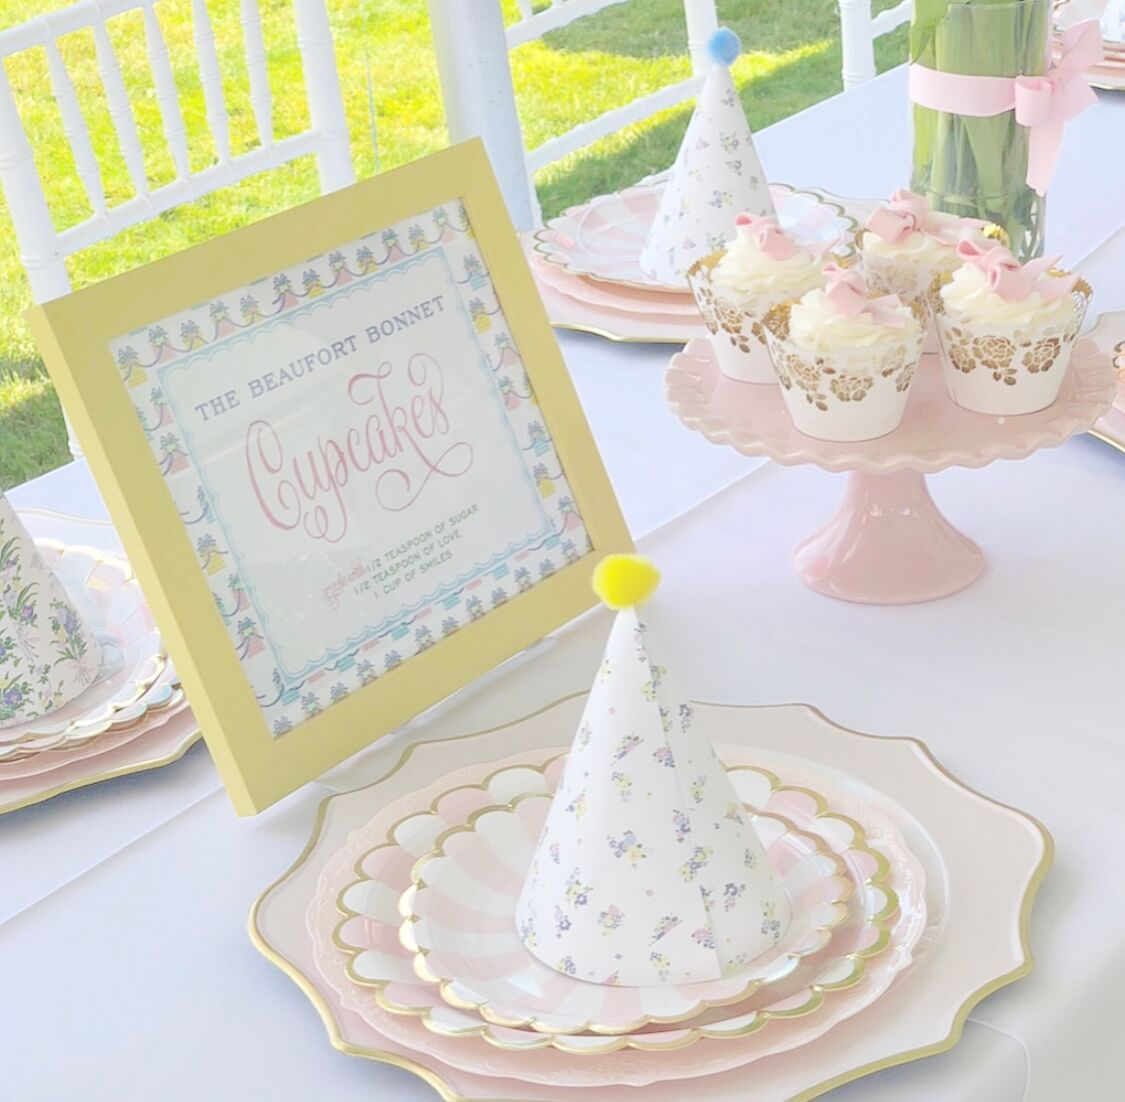 Beaufort Bonnet Company themed birthday